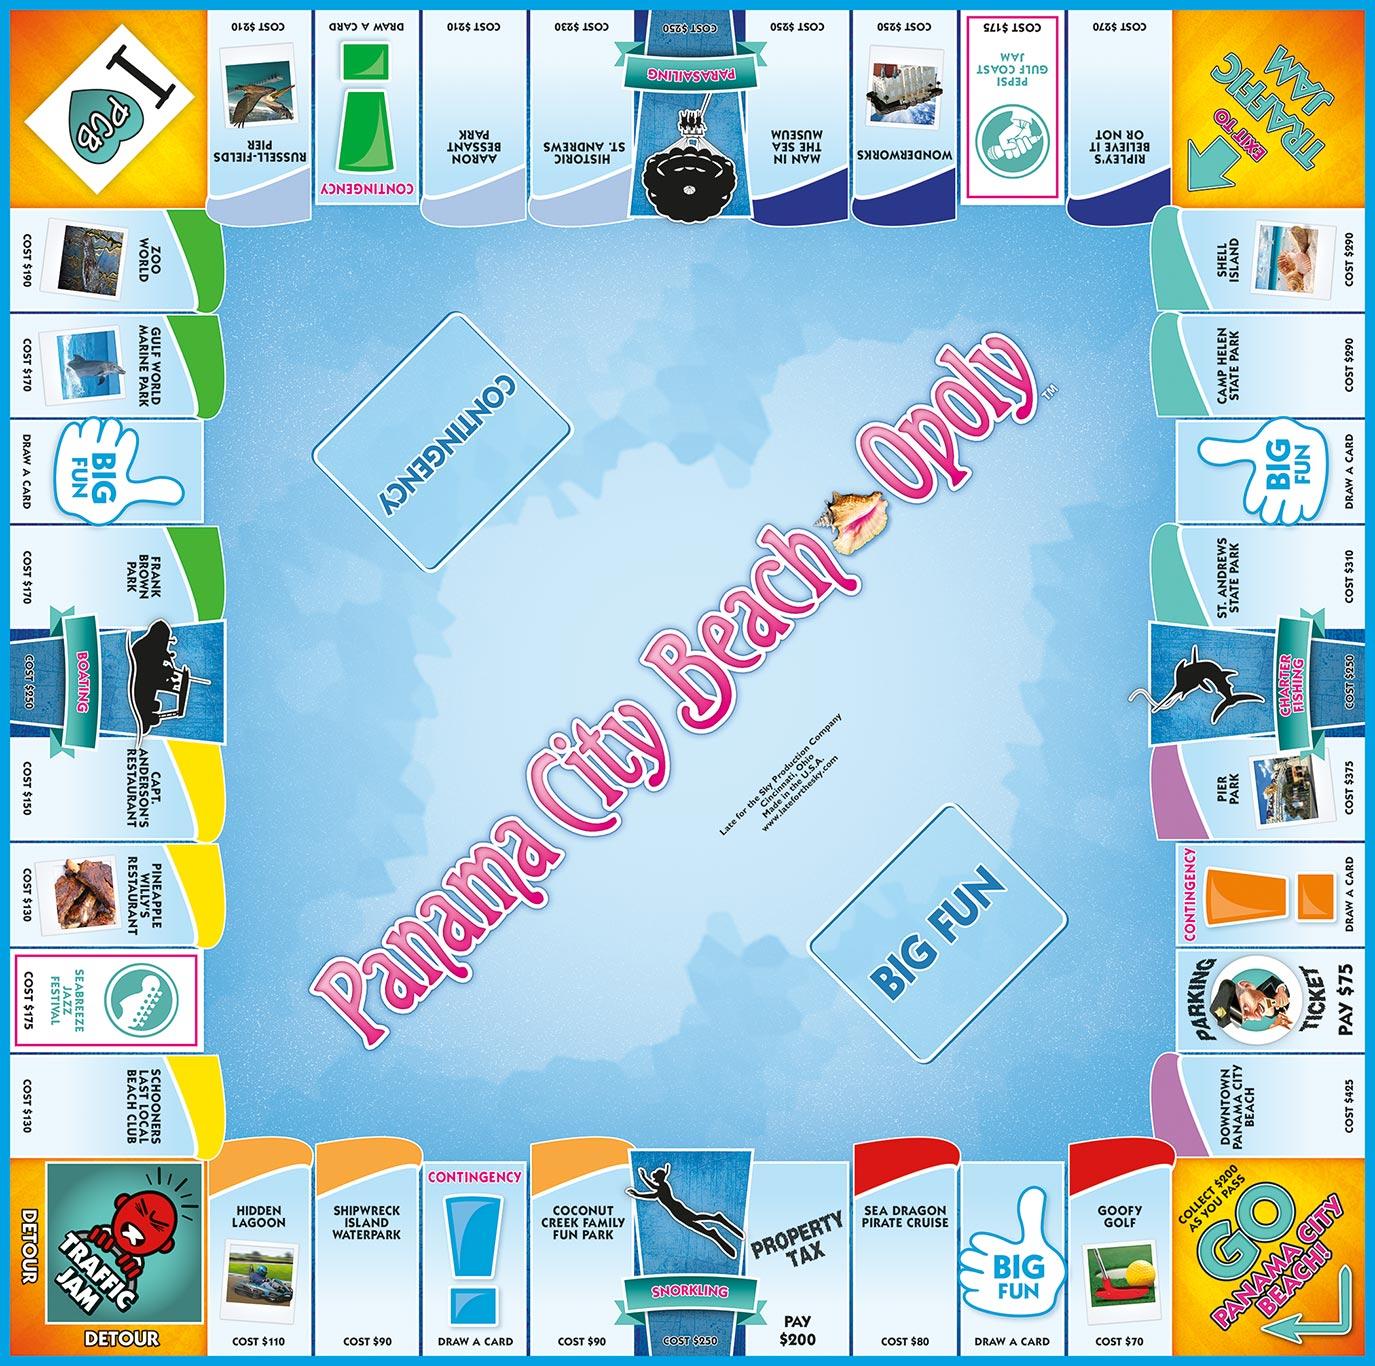 PANAMA CITY BEACH-OPOLY Board Game